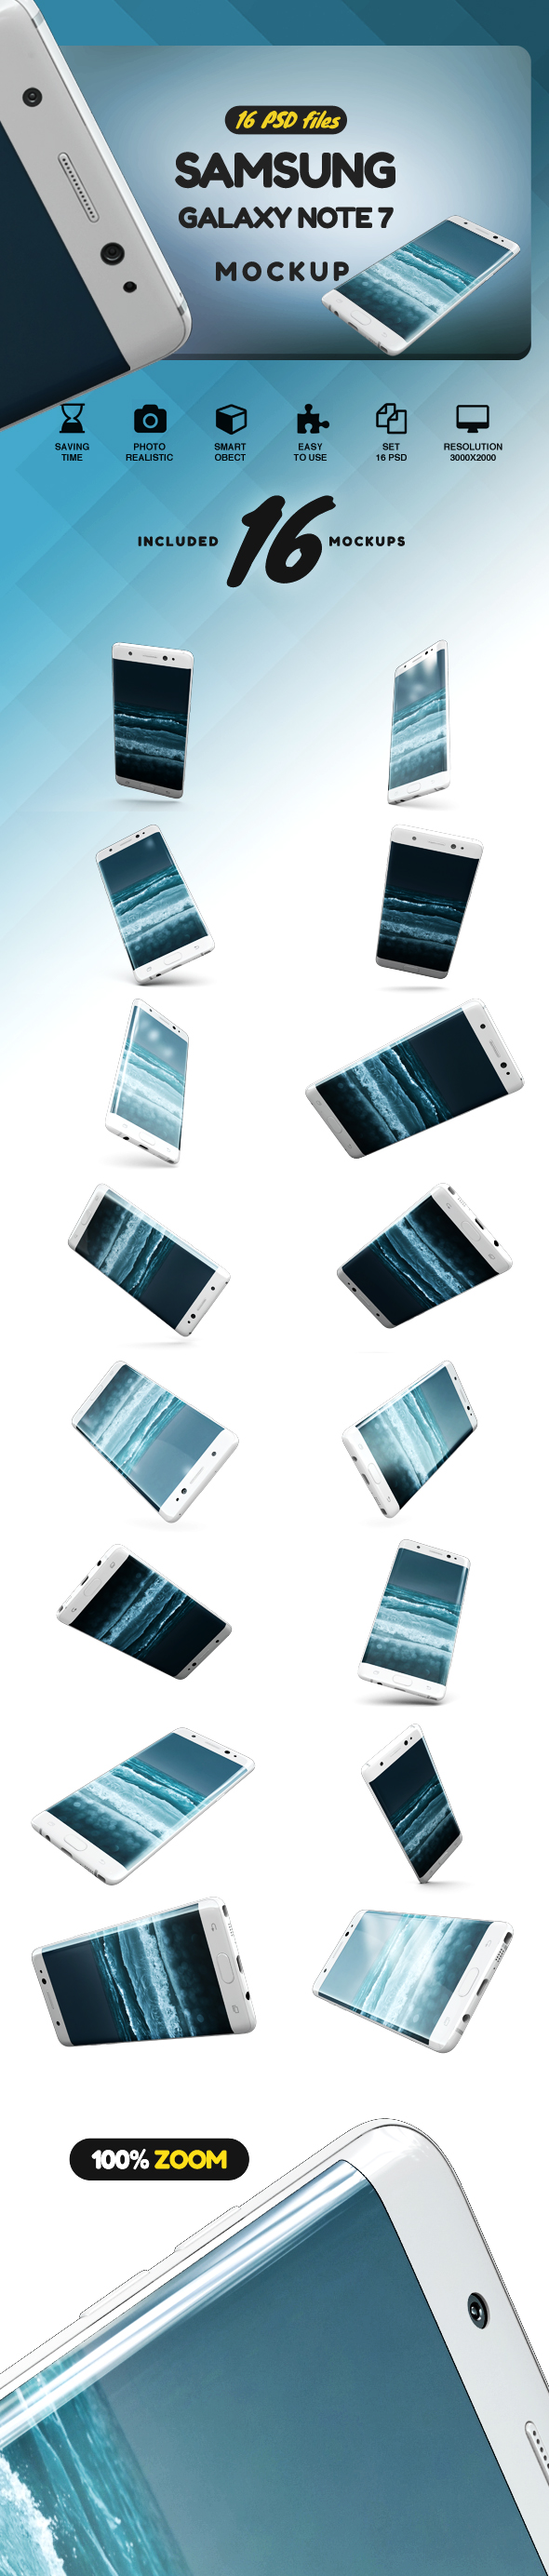 Samsung Galaxy Note 7 Gravity Mockup example image 2